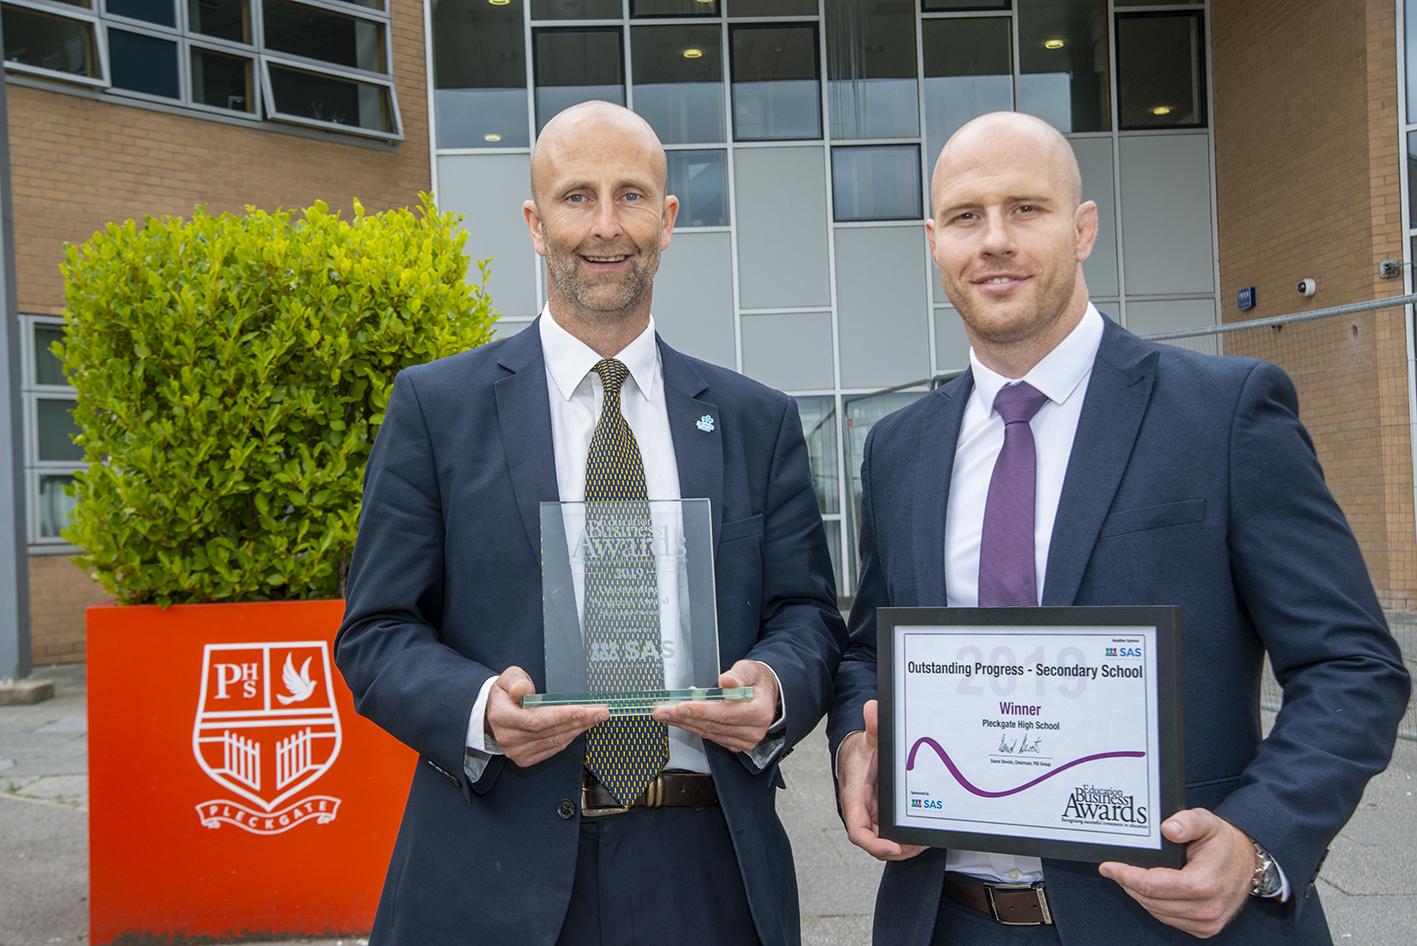 Outstanding Progress Award